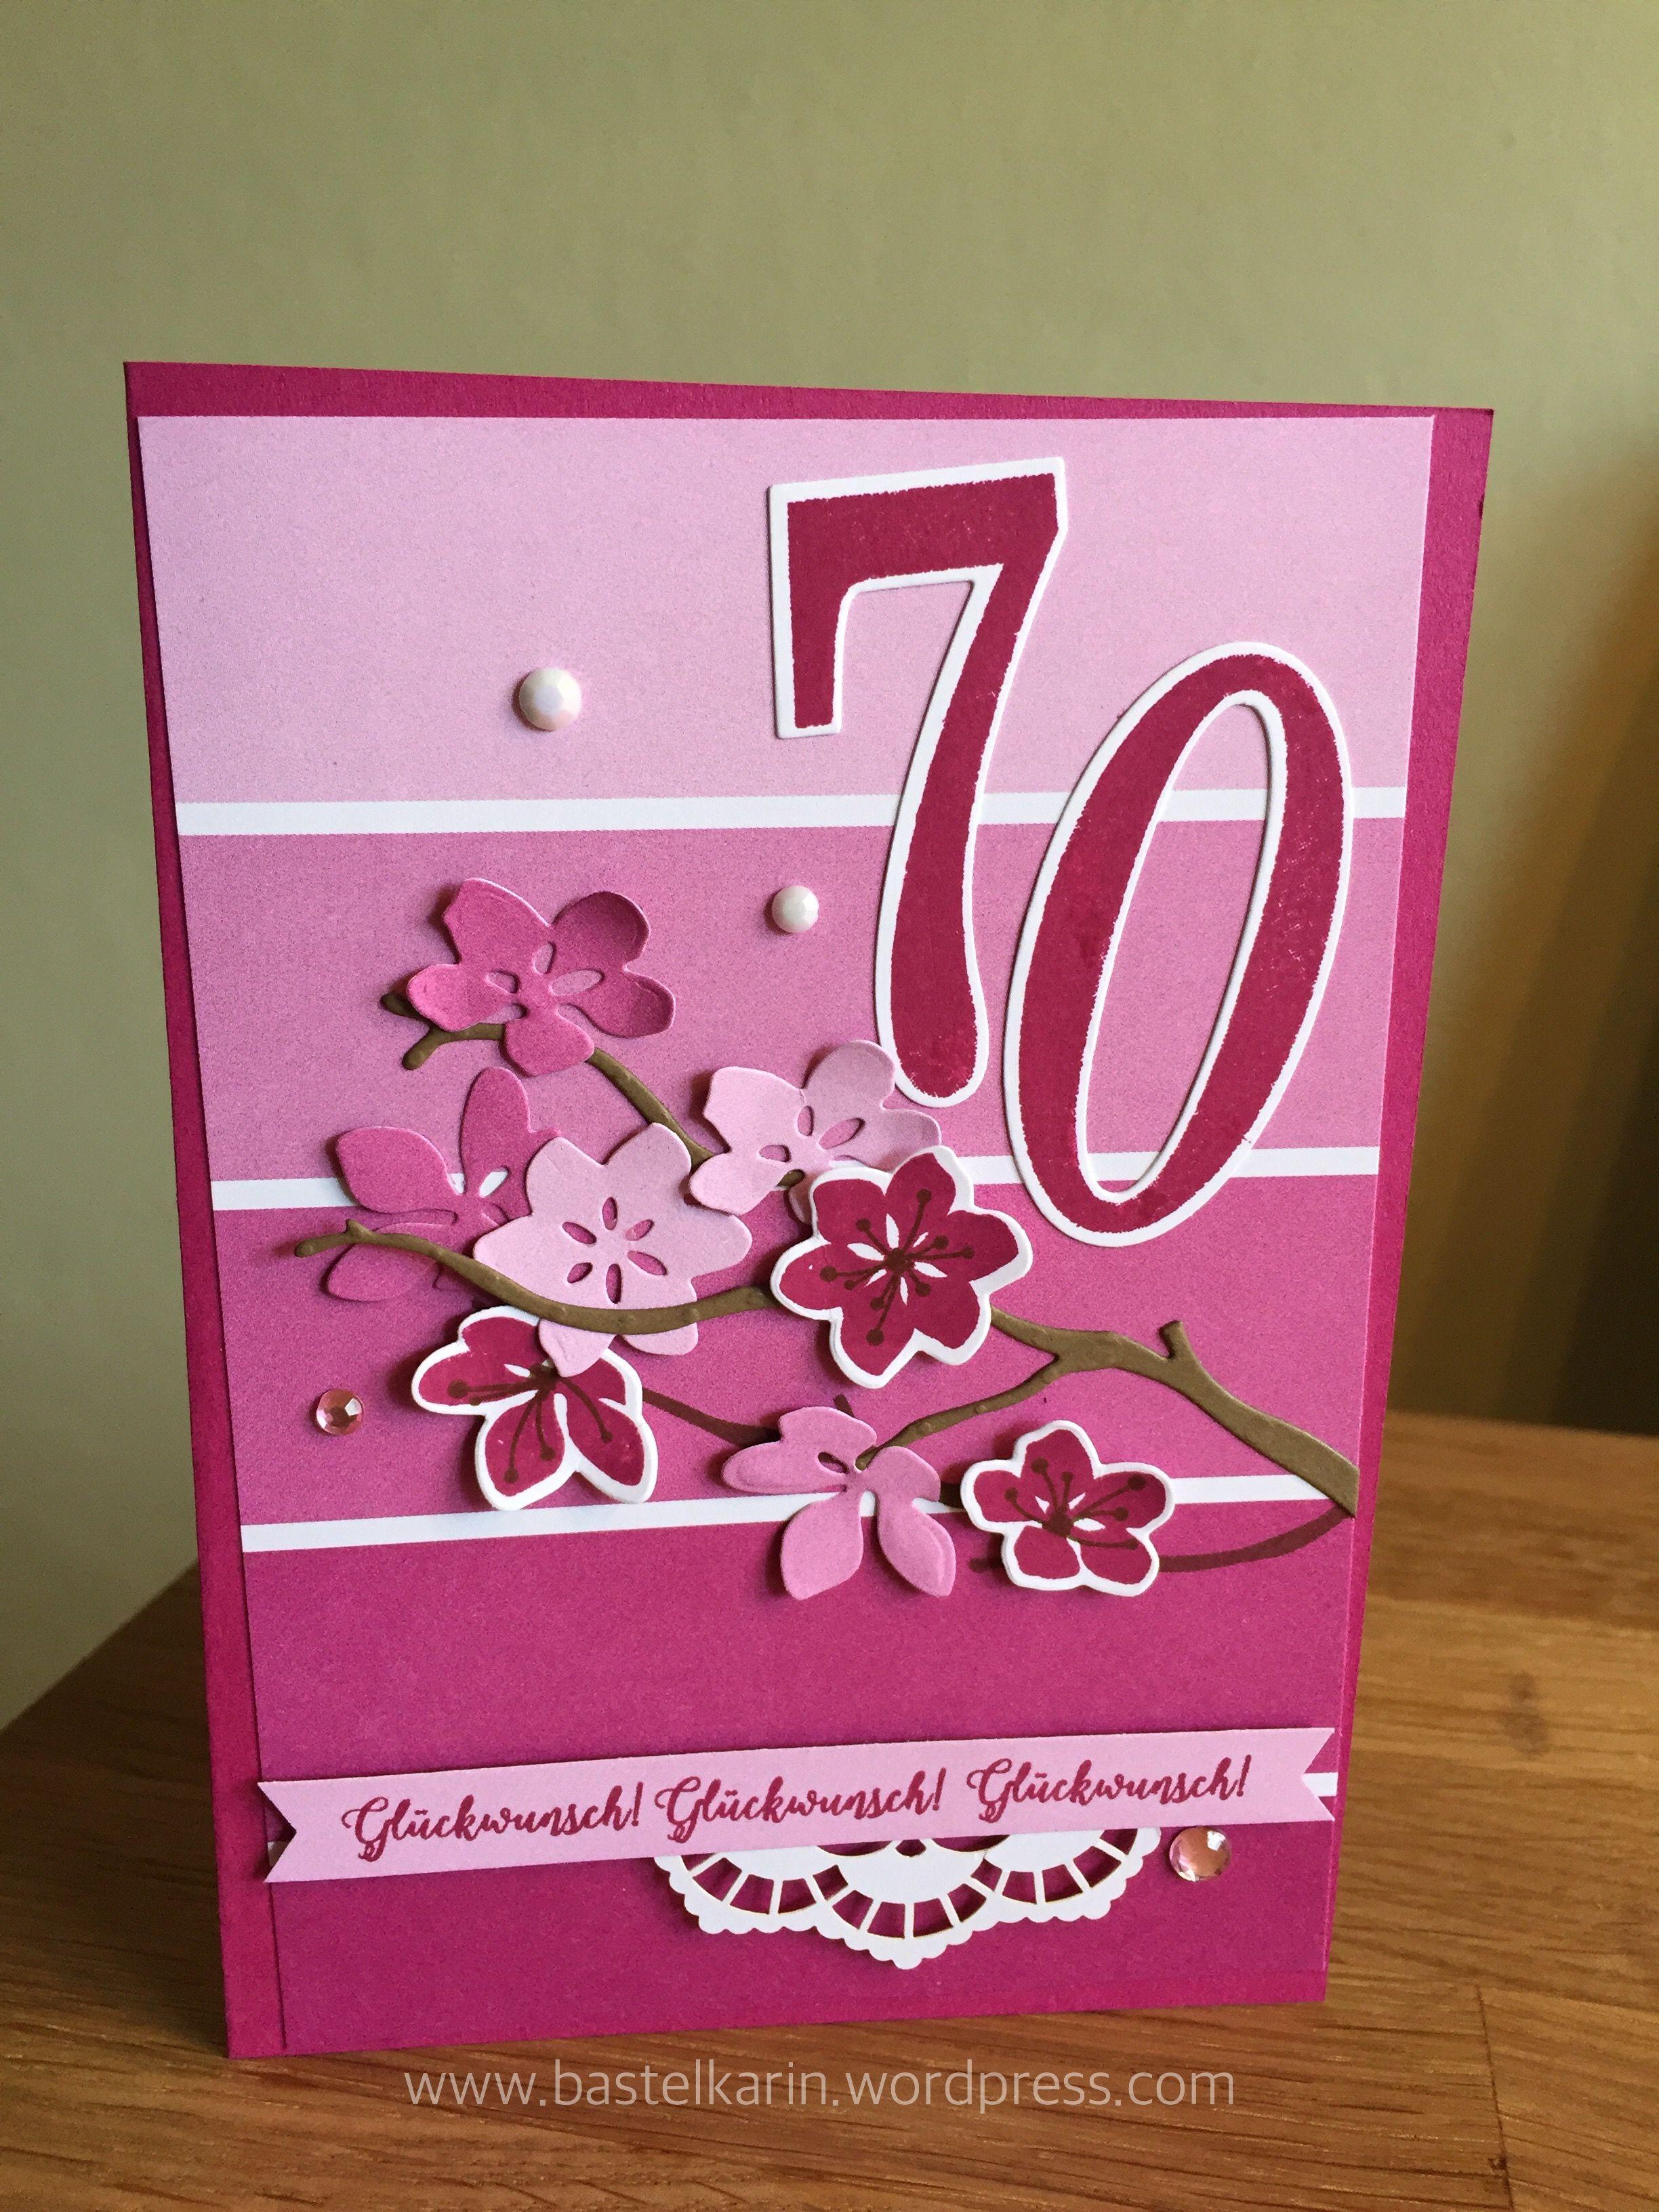 Karte Zum 70 Geburtstag Geburtstag Karte Geburtstag